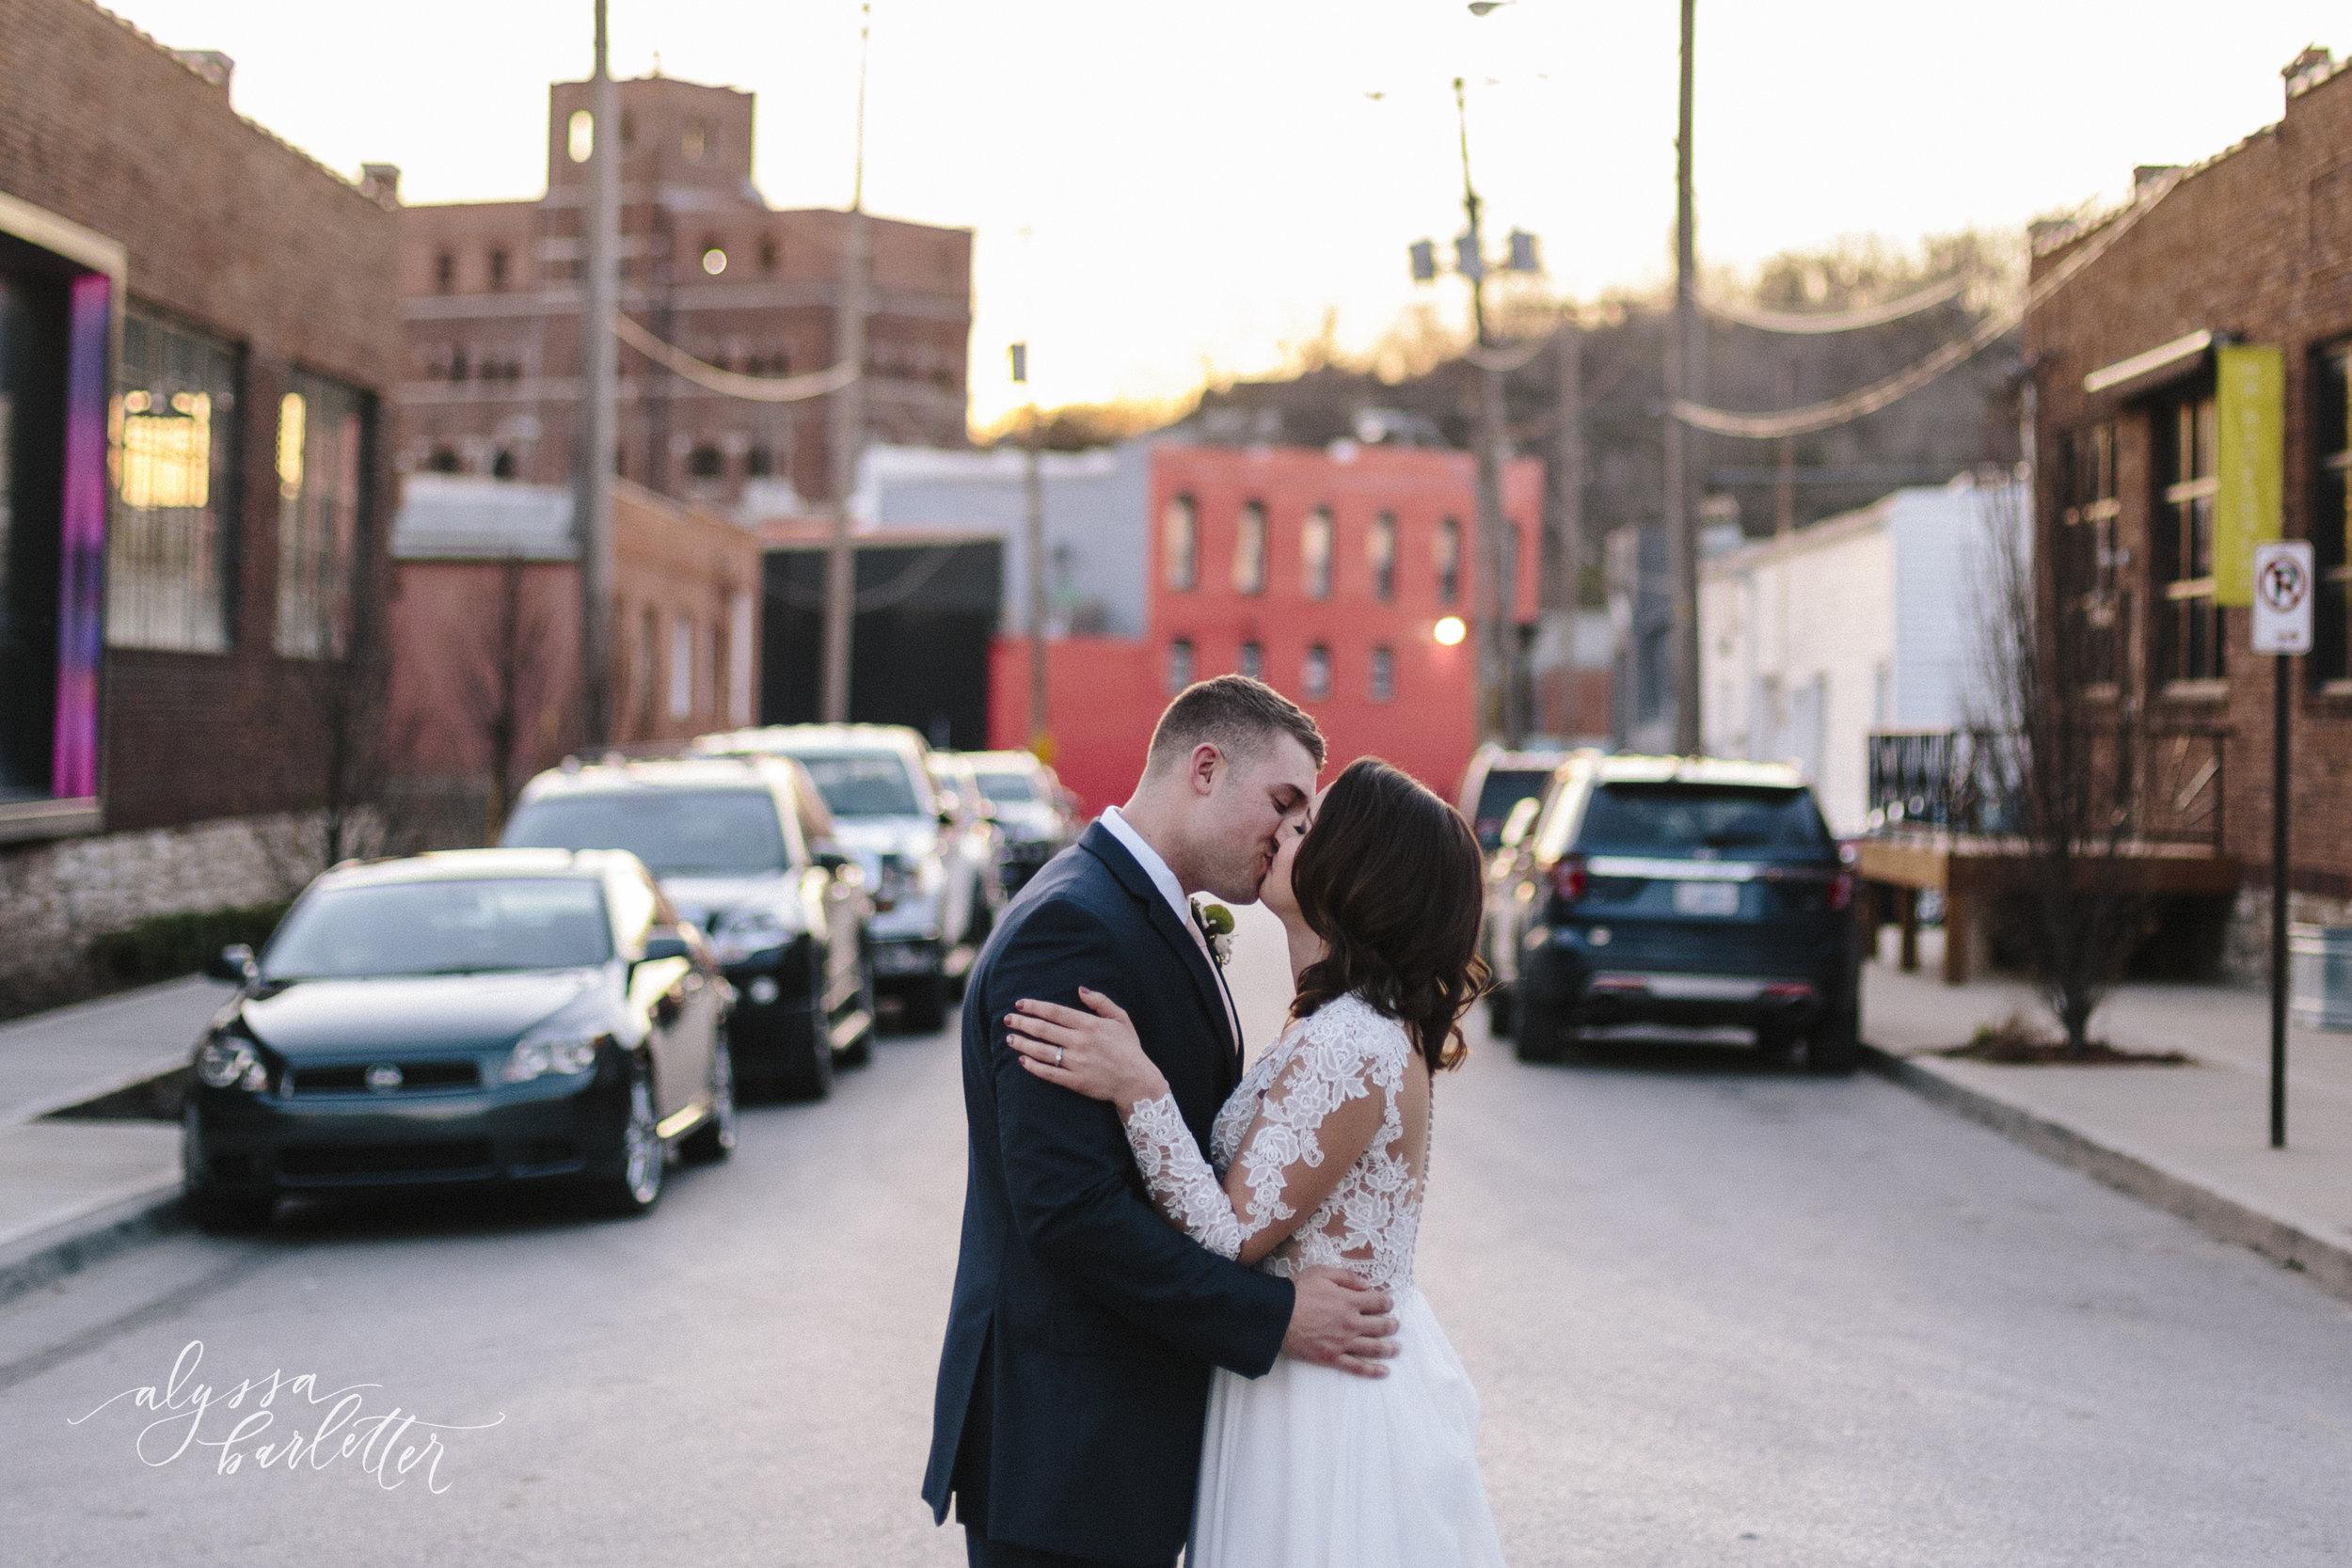 alyssa barletter wedding photography-900-10.jpg